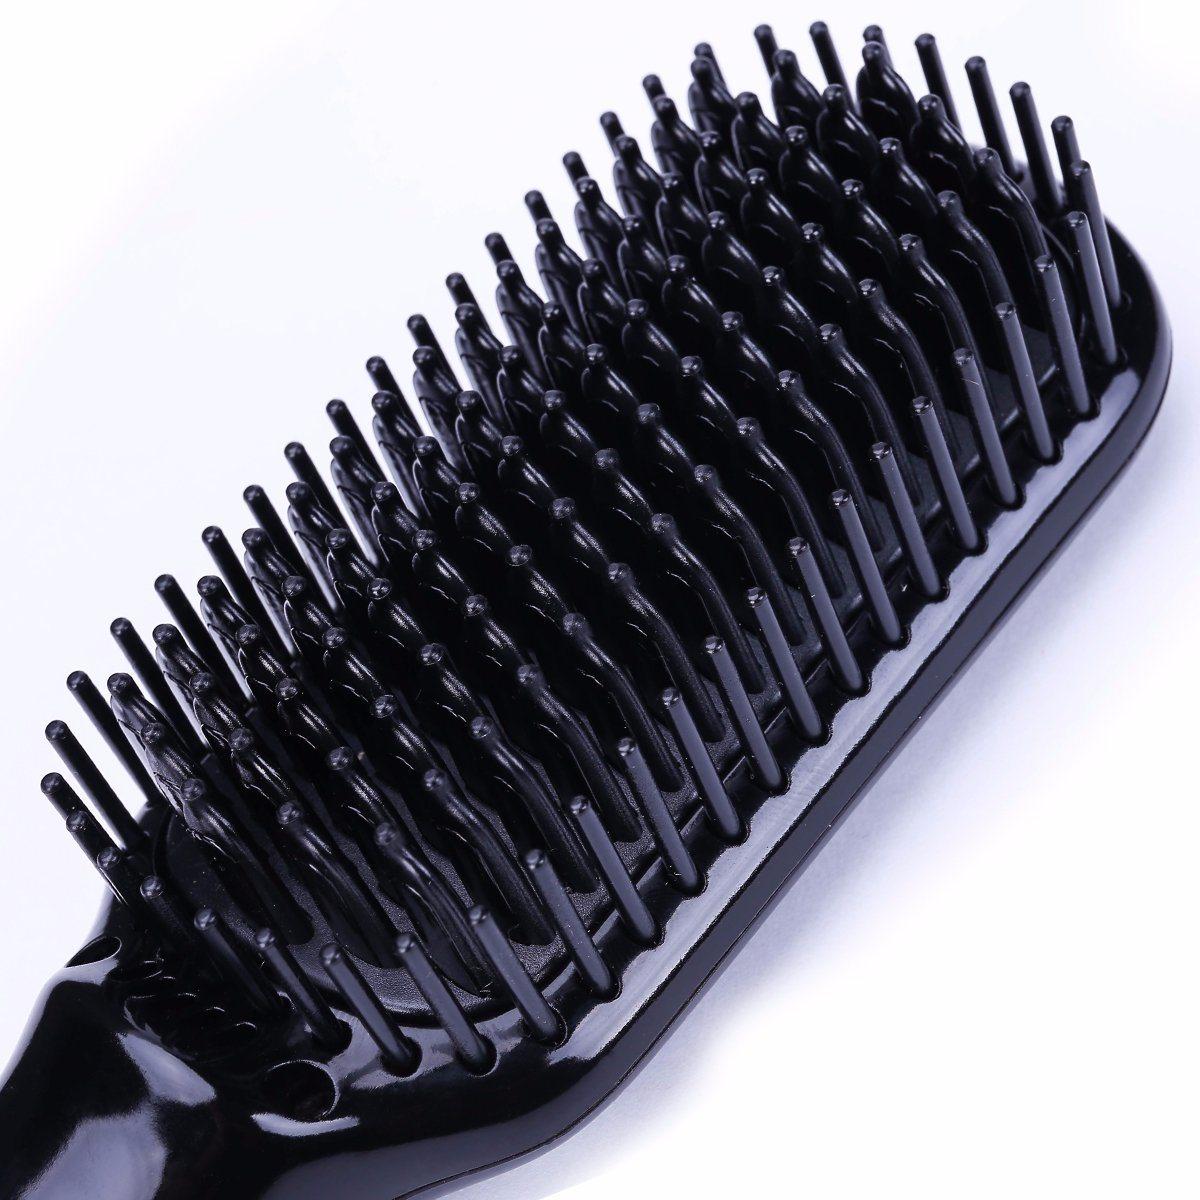 Professional Hair Salon Equipments Ceramic Hair Straightener